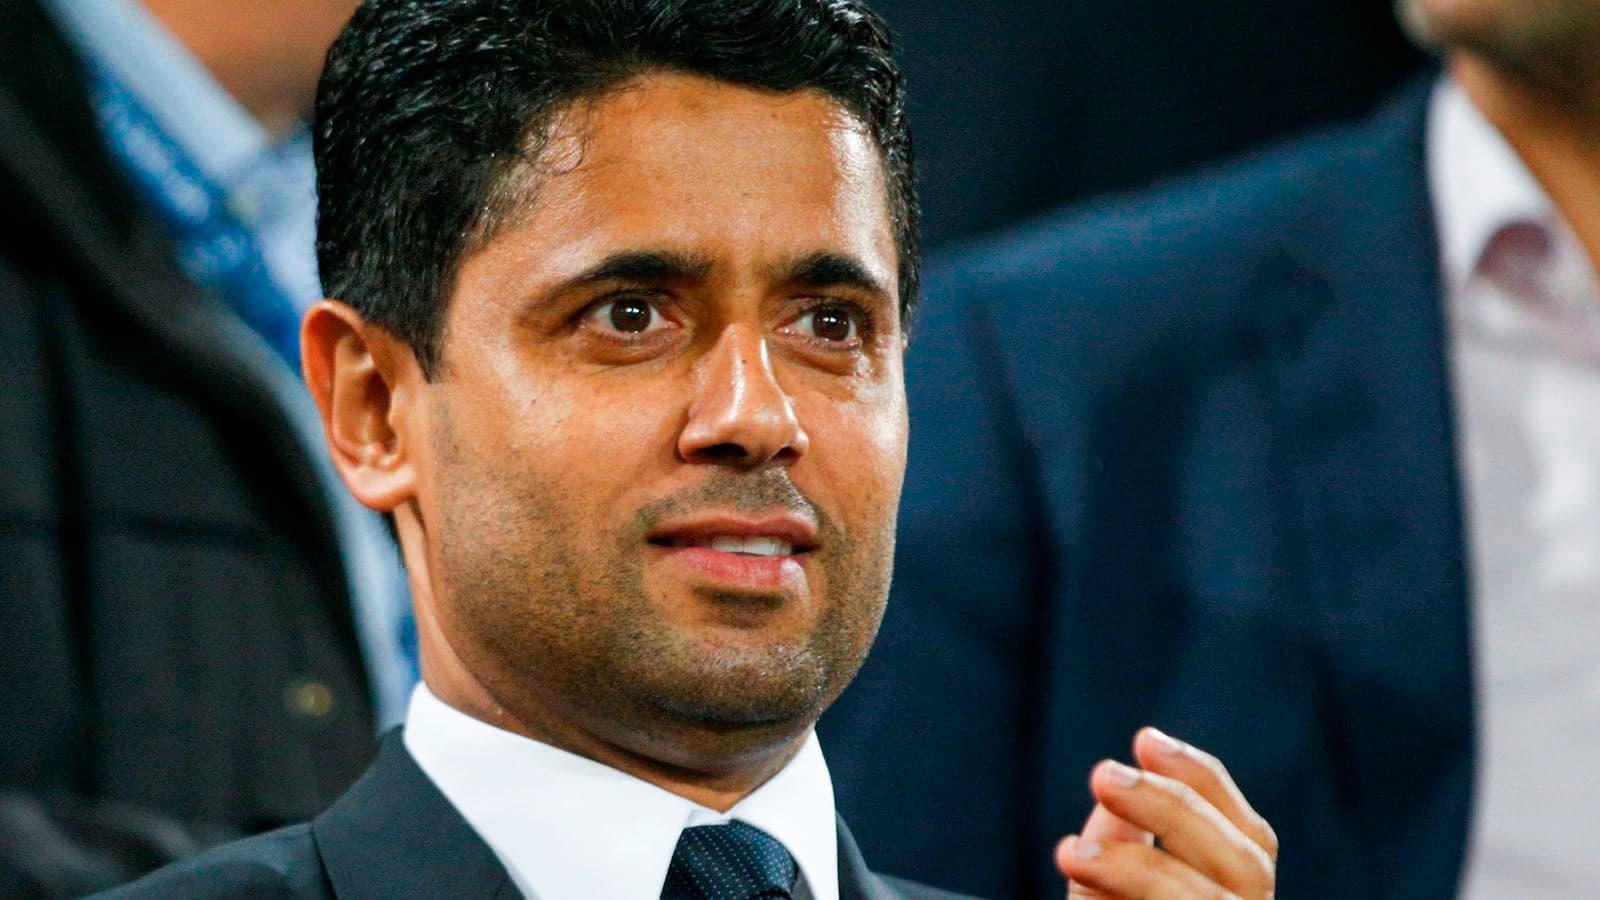 Nasser Al Khelaifi re-elected into UEFA Executive Committee as ECA representative; applauded for rejecting ESL